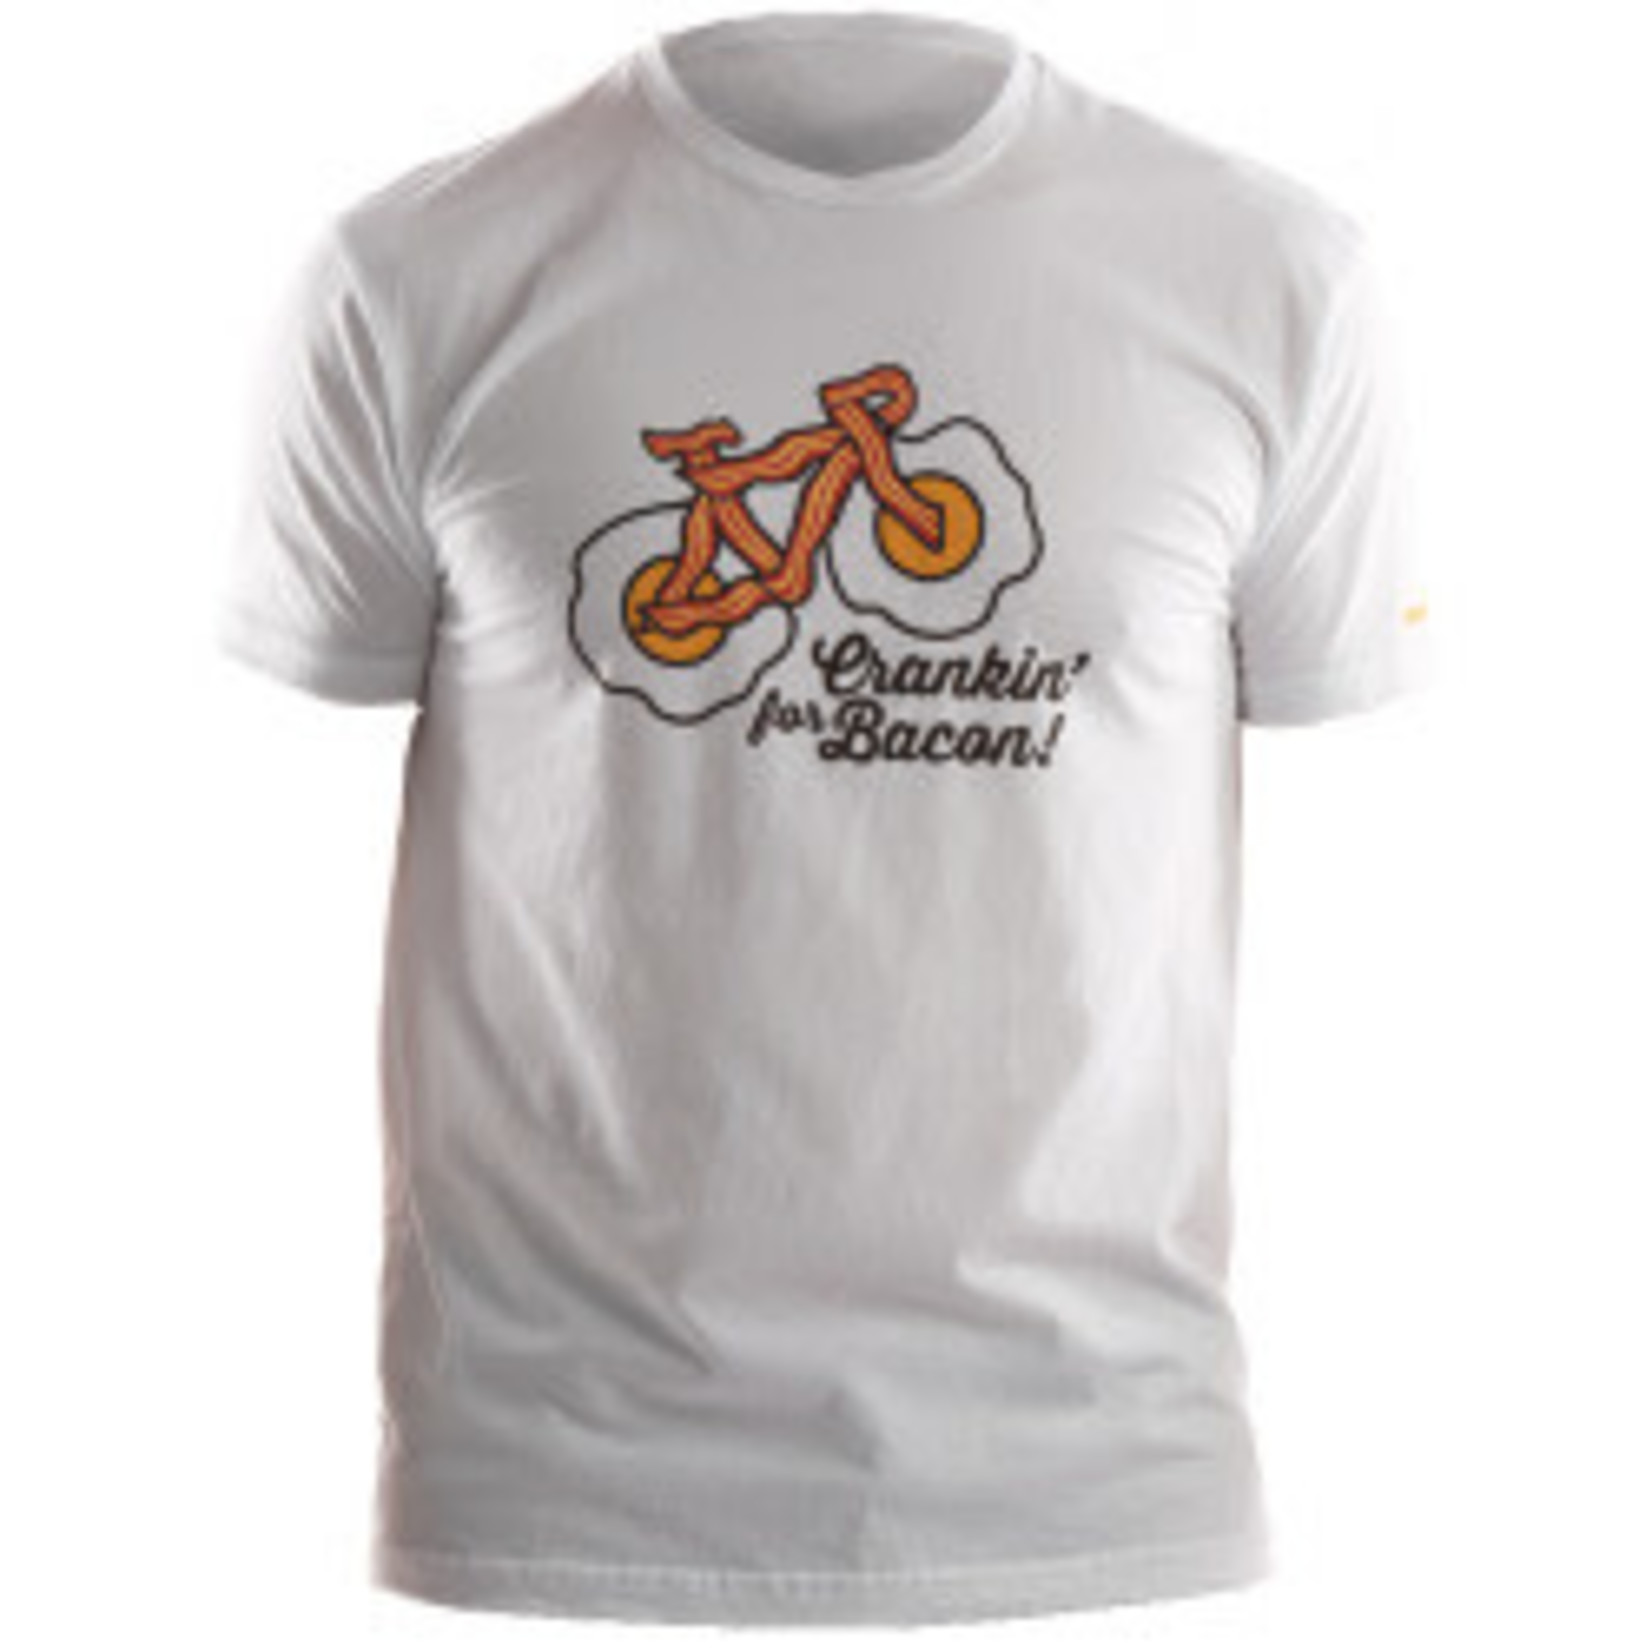 Pearl iZUMi Pearl Izumi - T-Shirt White Crankin Bacon